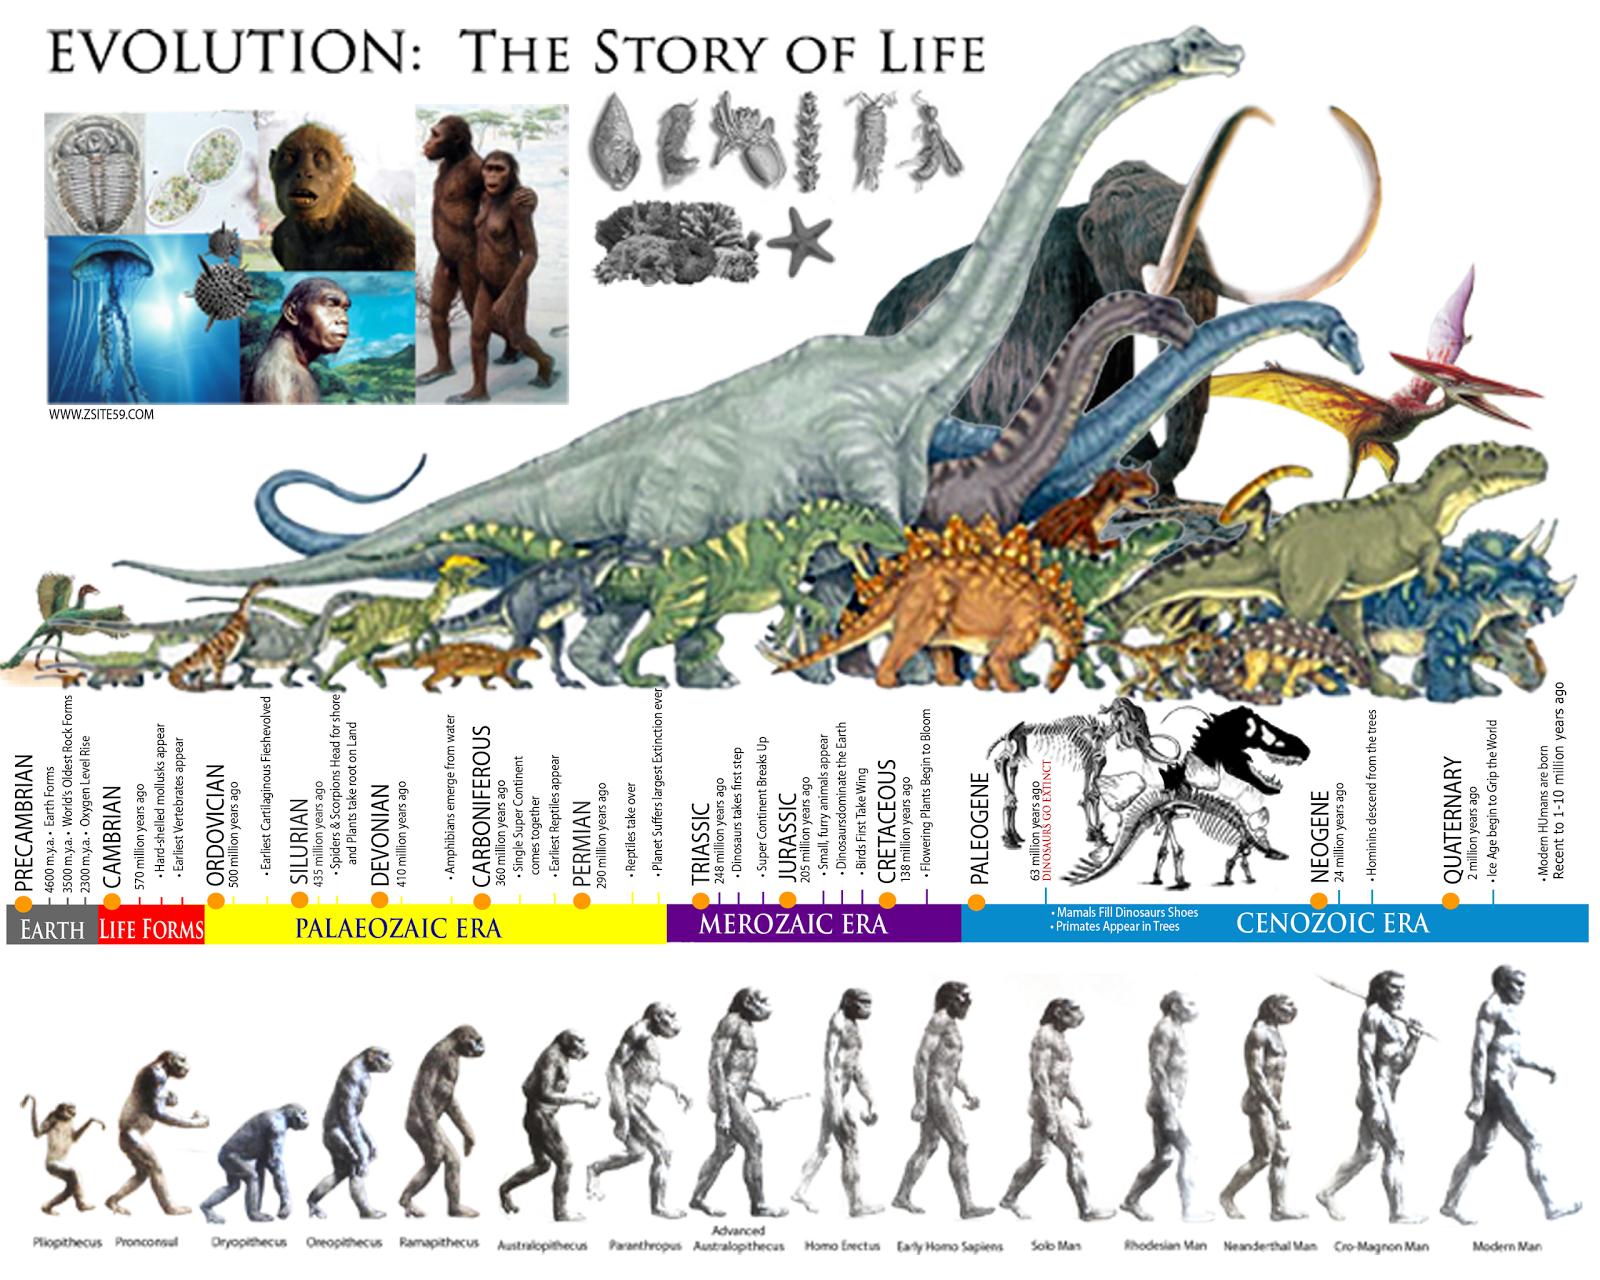 Lars krutak tatu lu tattoos from the dreamtime lars krutak - Evolution The Story Of Life Prehistoric Eras Dinosaur